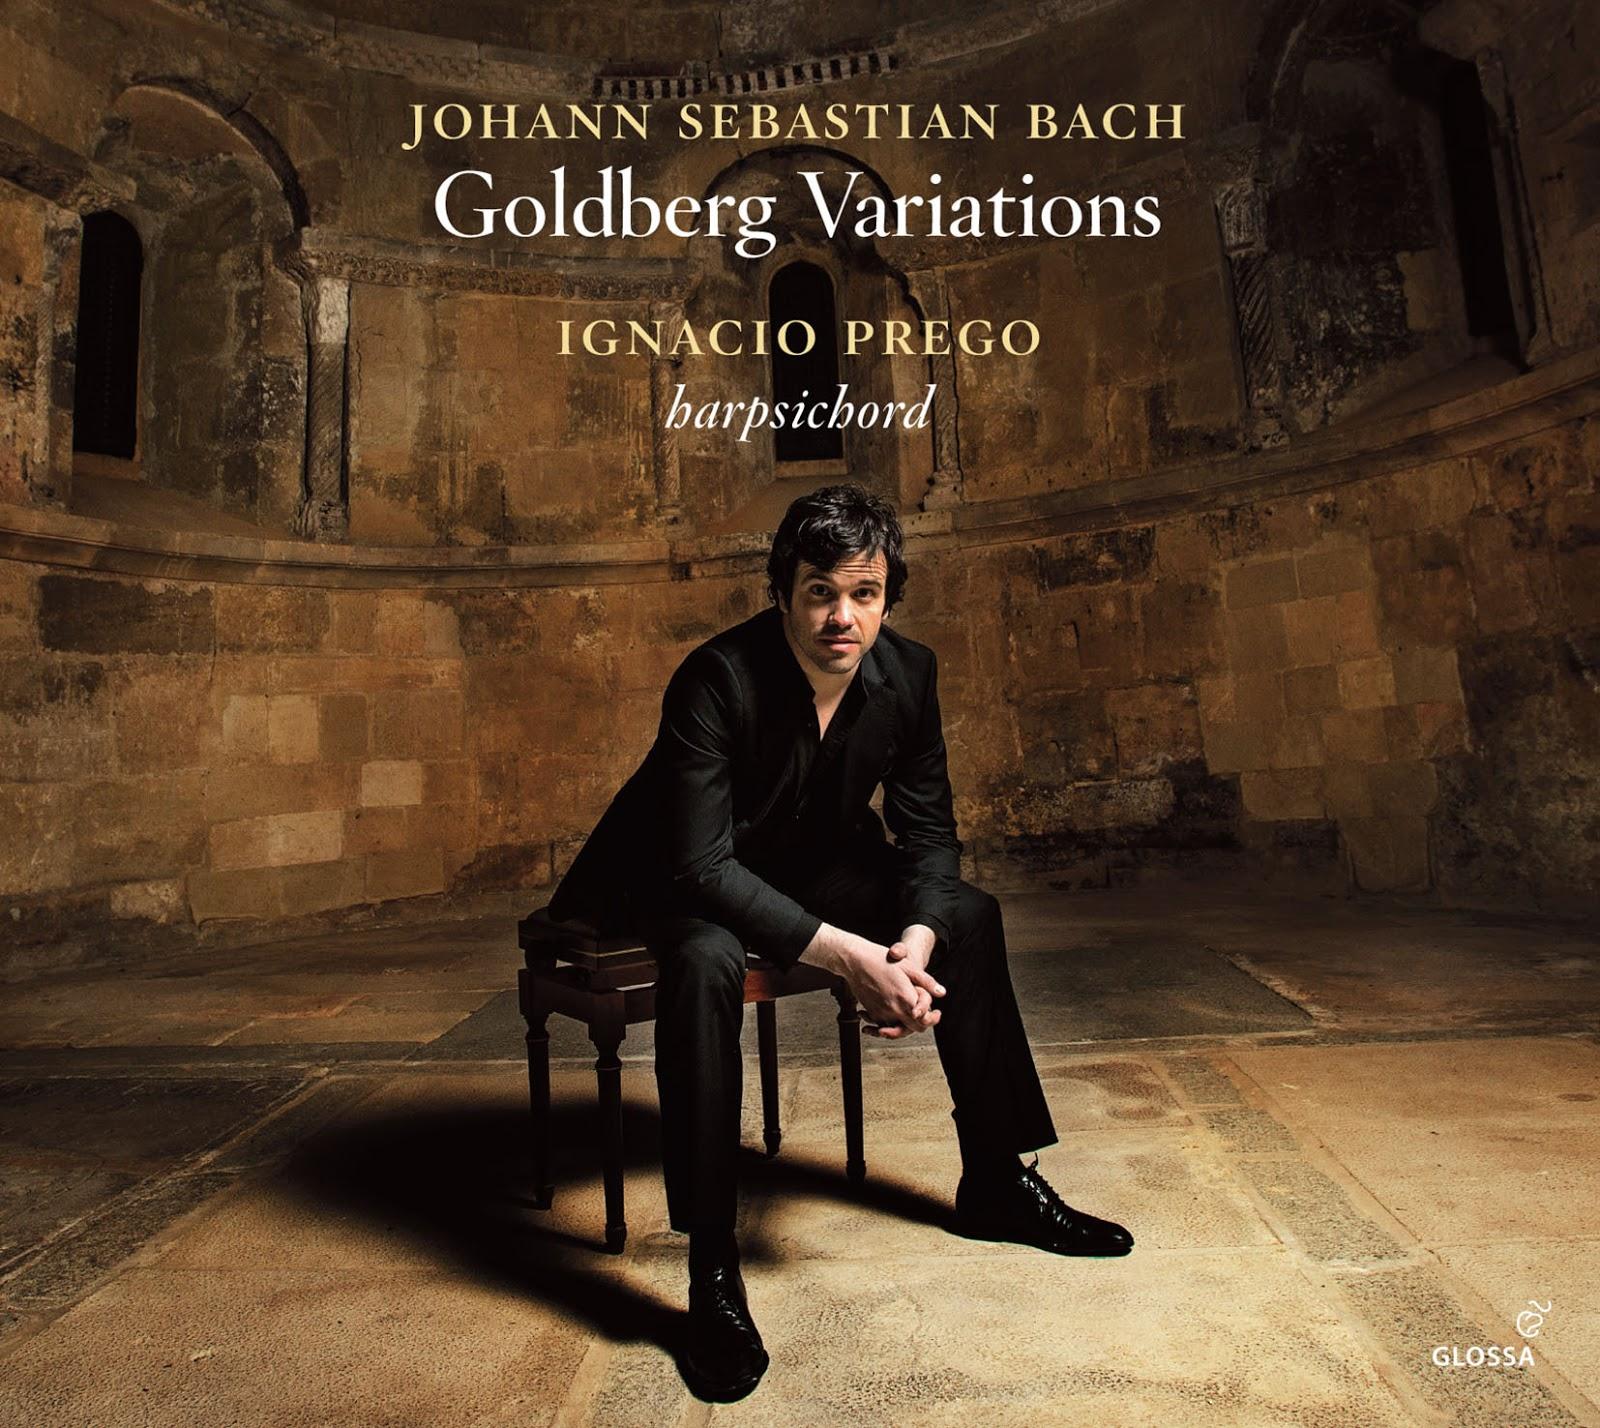 BEST INSTRUMENTAL SOLO RECORDING OF 2016: Johann Sebastian Bach - GOLDBERG VARIATIONS, BWV 988 (Glossa GCD 923510)